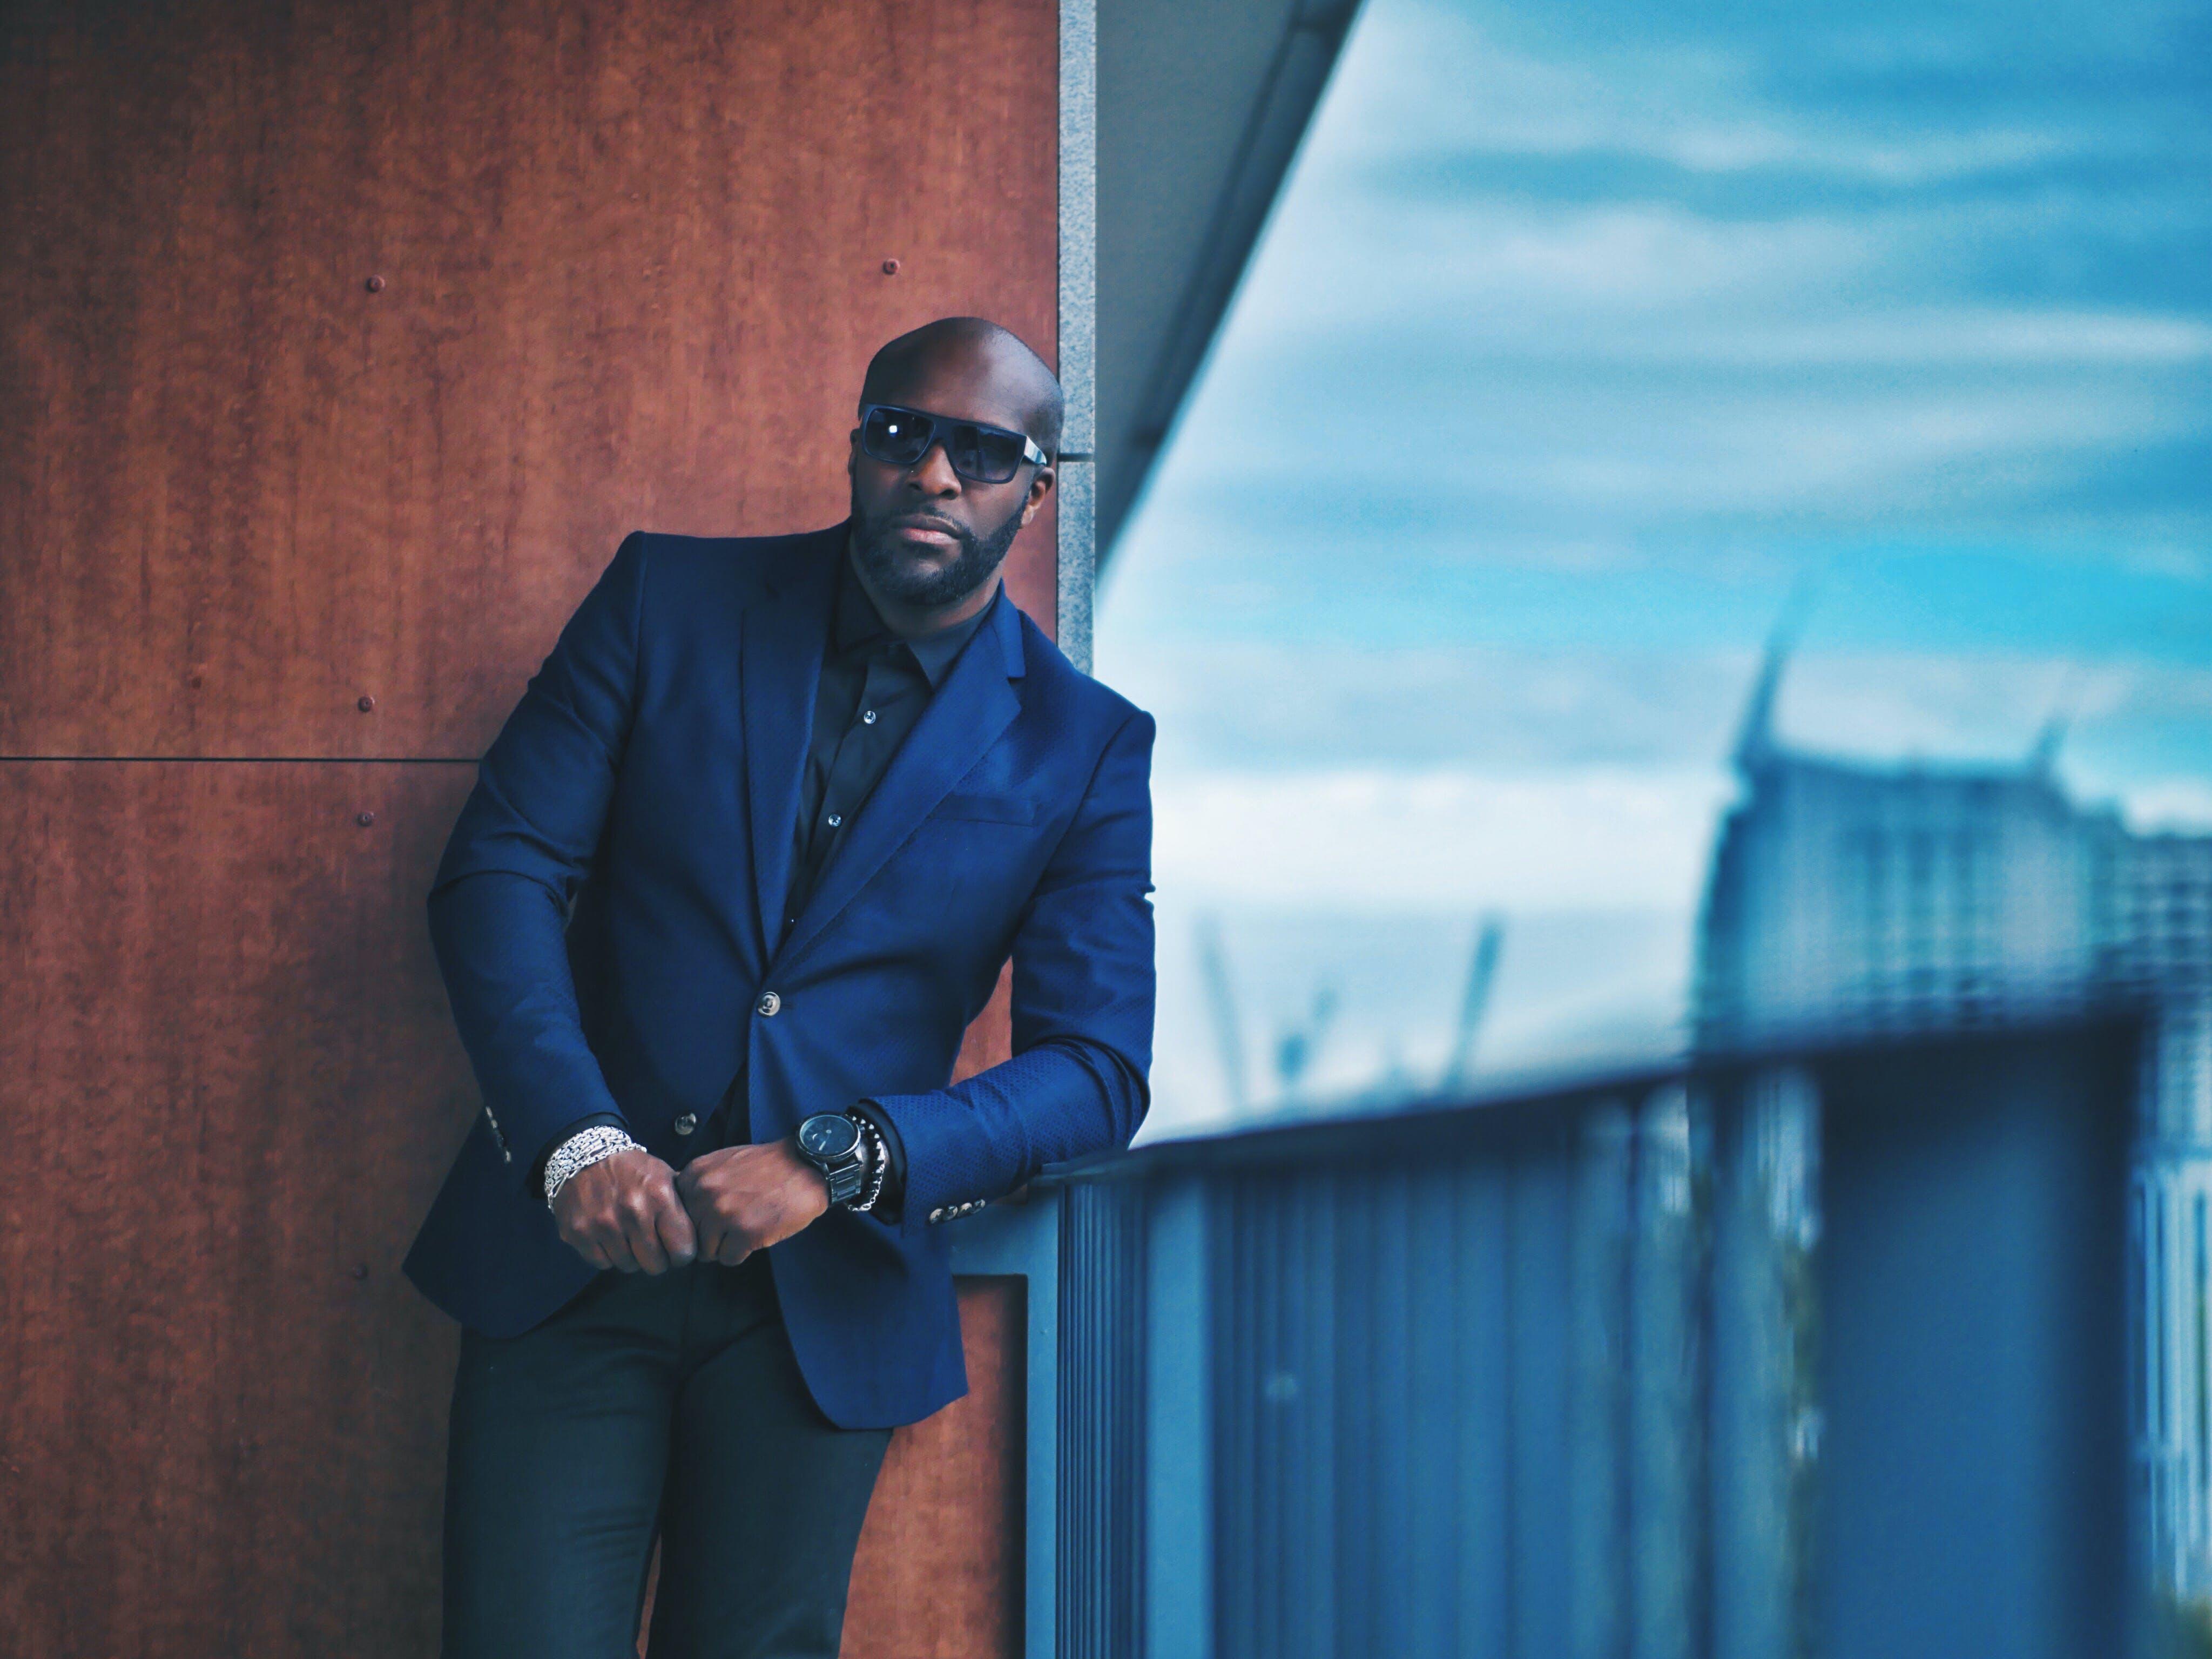 Men's Blue Formal Suit Jacket